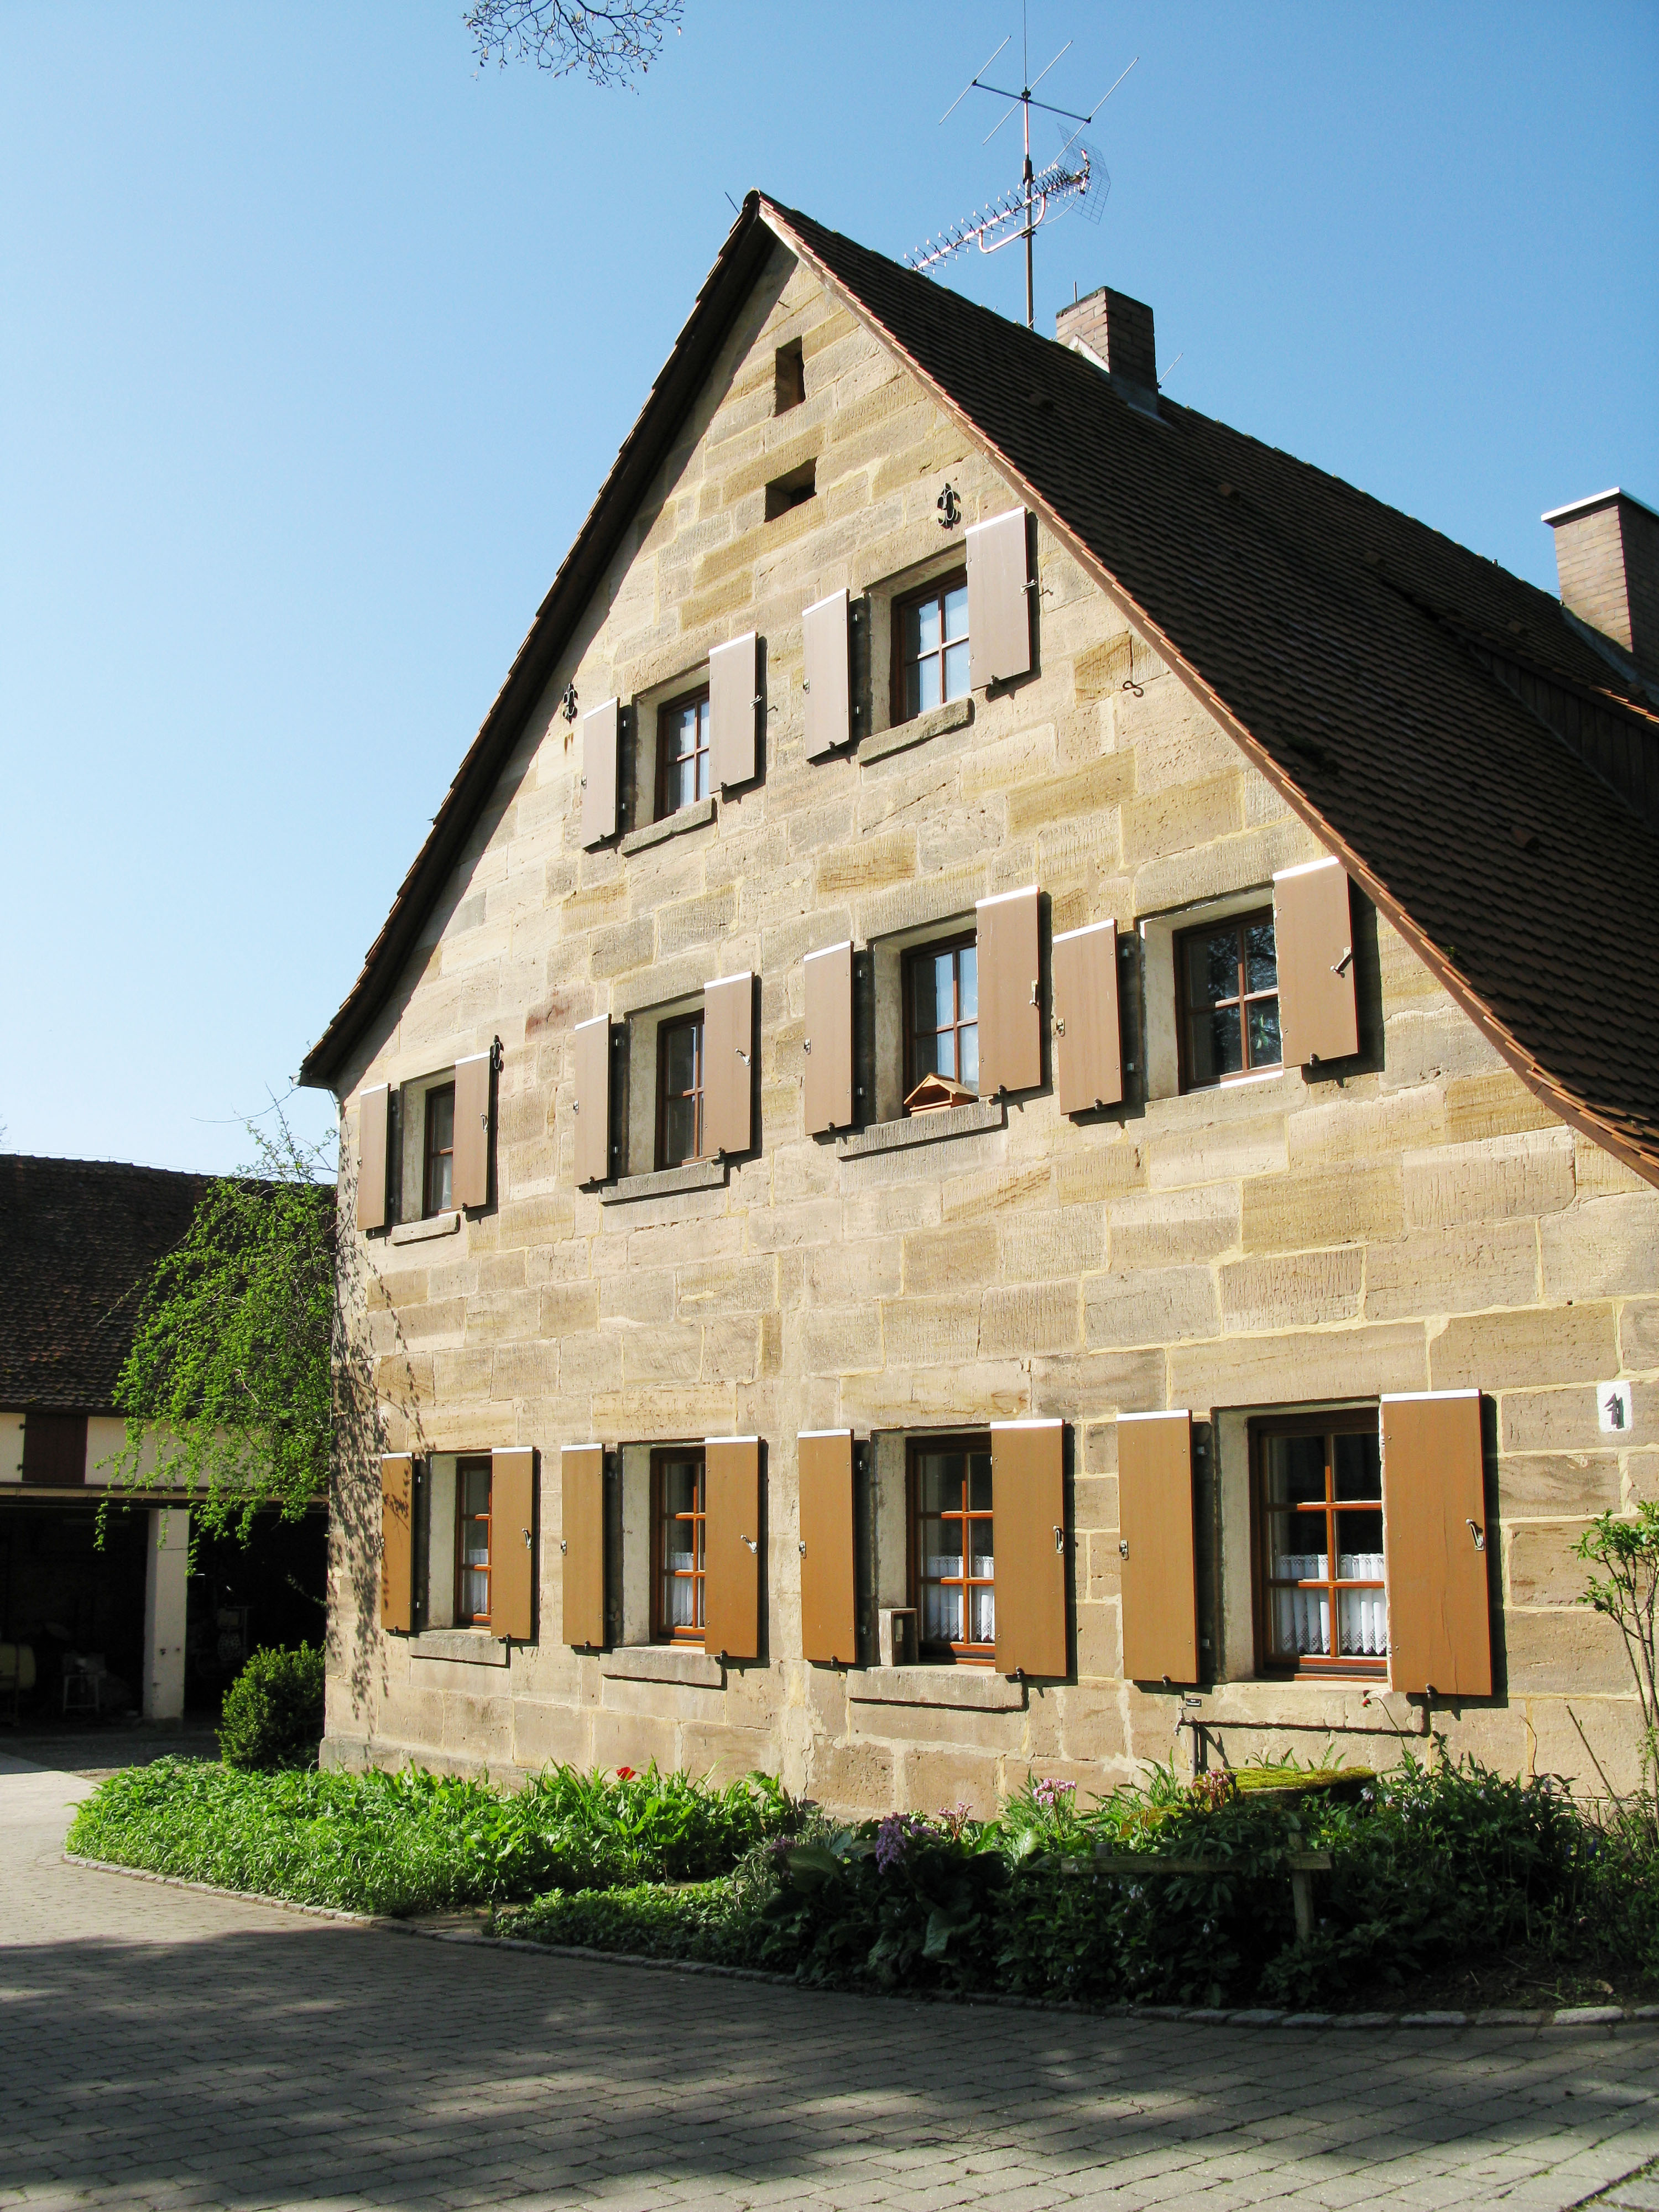 Bauernhof Rossendorf